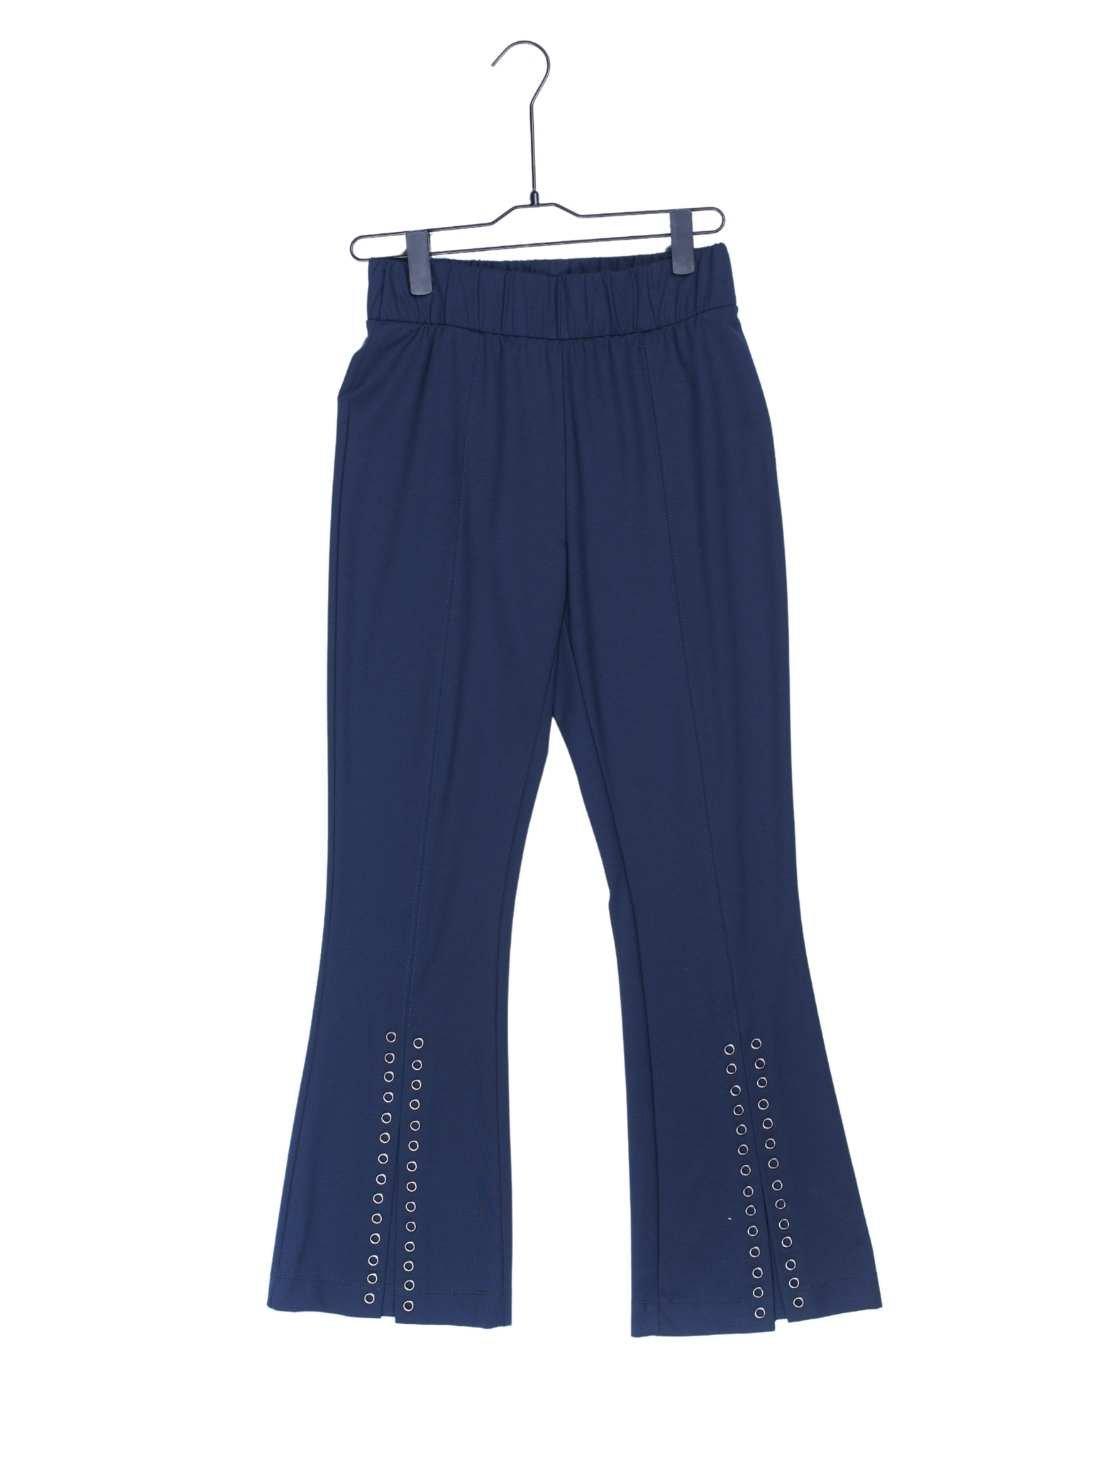 Ladies Ponti Roma Slub Pants Bottom with Eyelet Slits